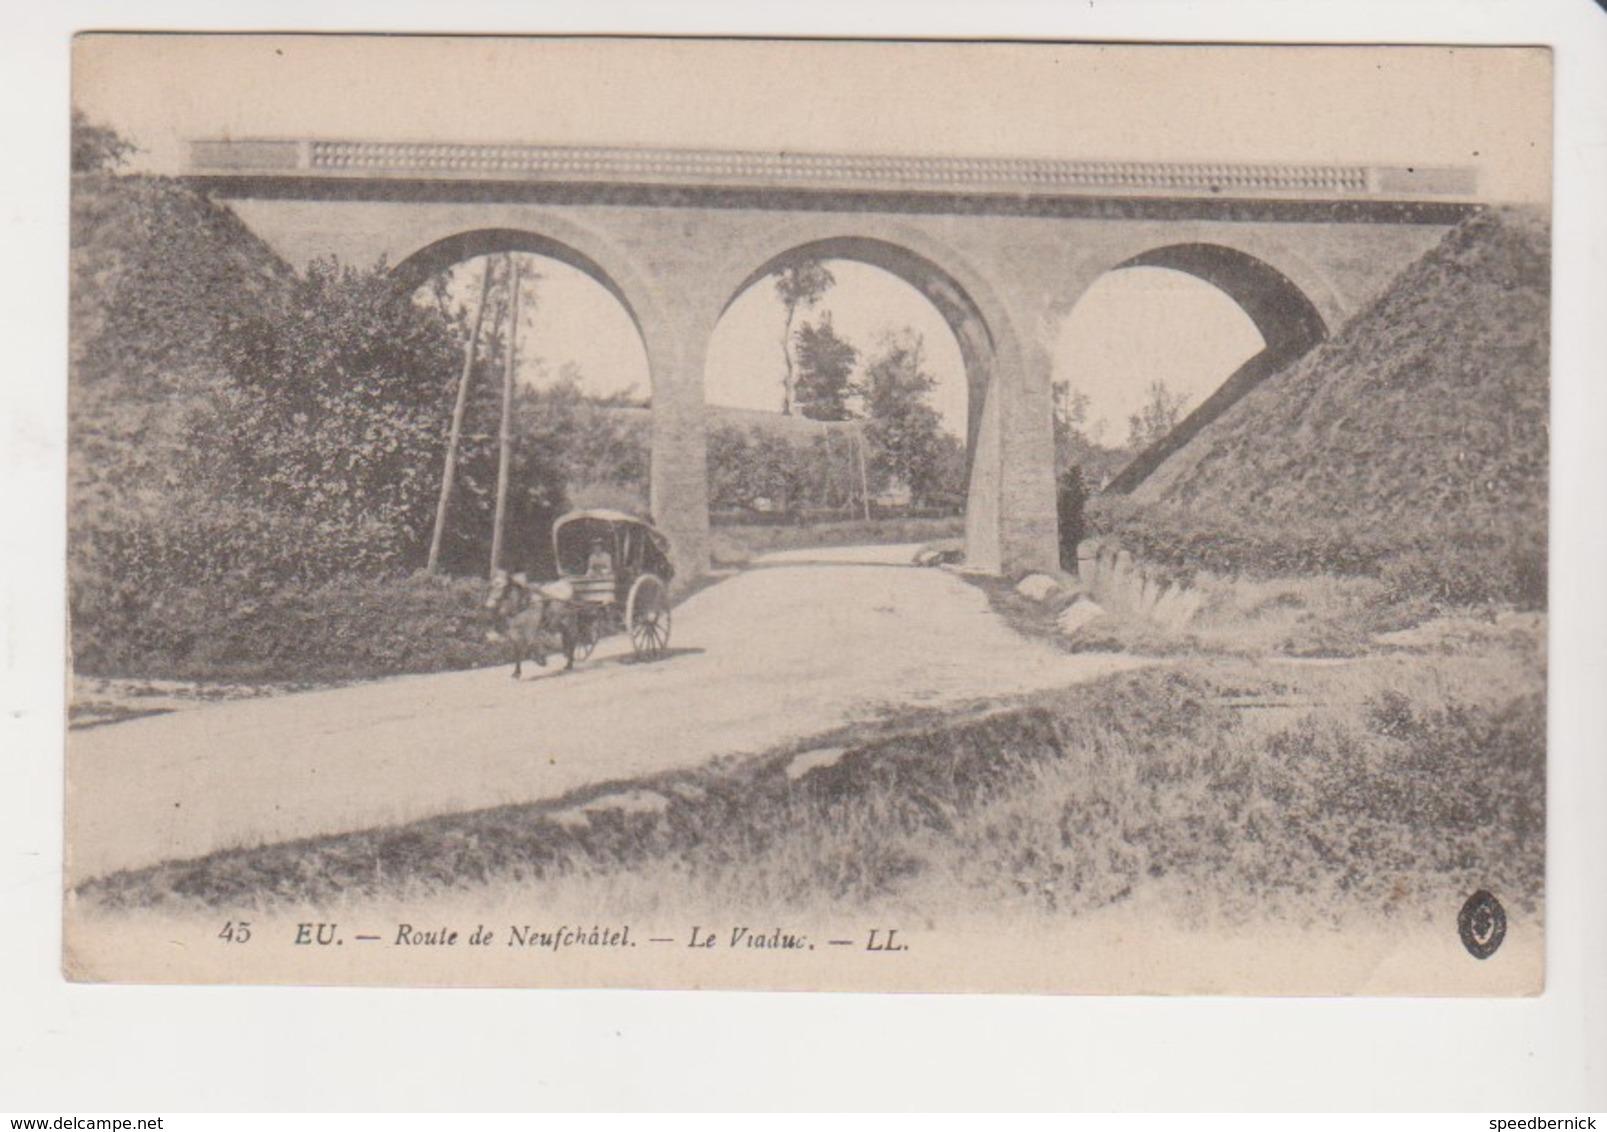 26770 Eu Route Neufchatel France Viaduc Pont Chemins Fer -45 LL .caleche Guerre Correspondance Redon Hubert - Ouvrages D'Art